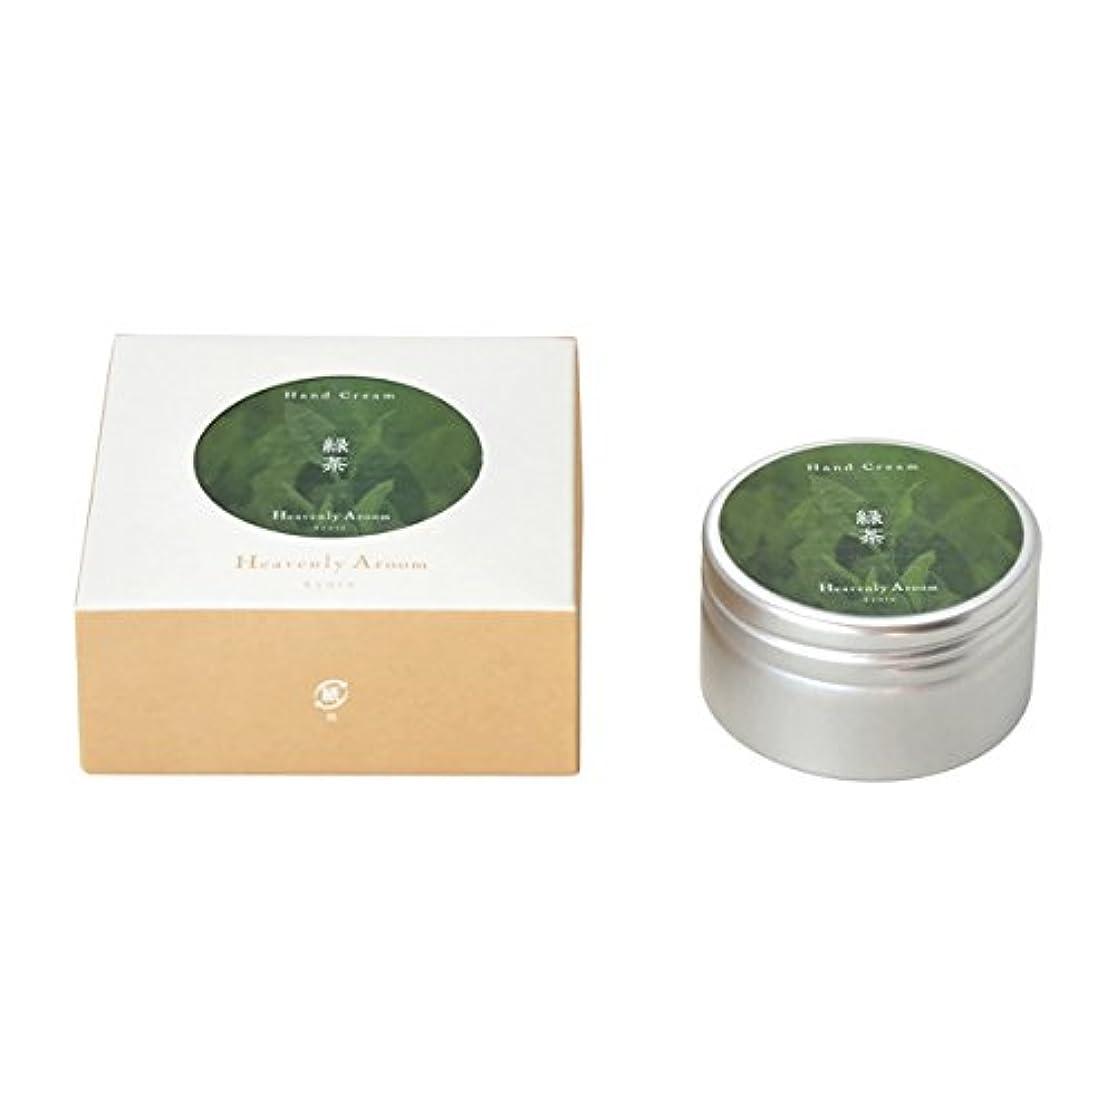 Heavenly Aroom ハンドクリーム 緑茶 30g